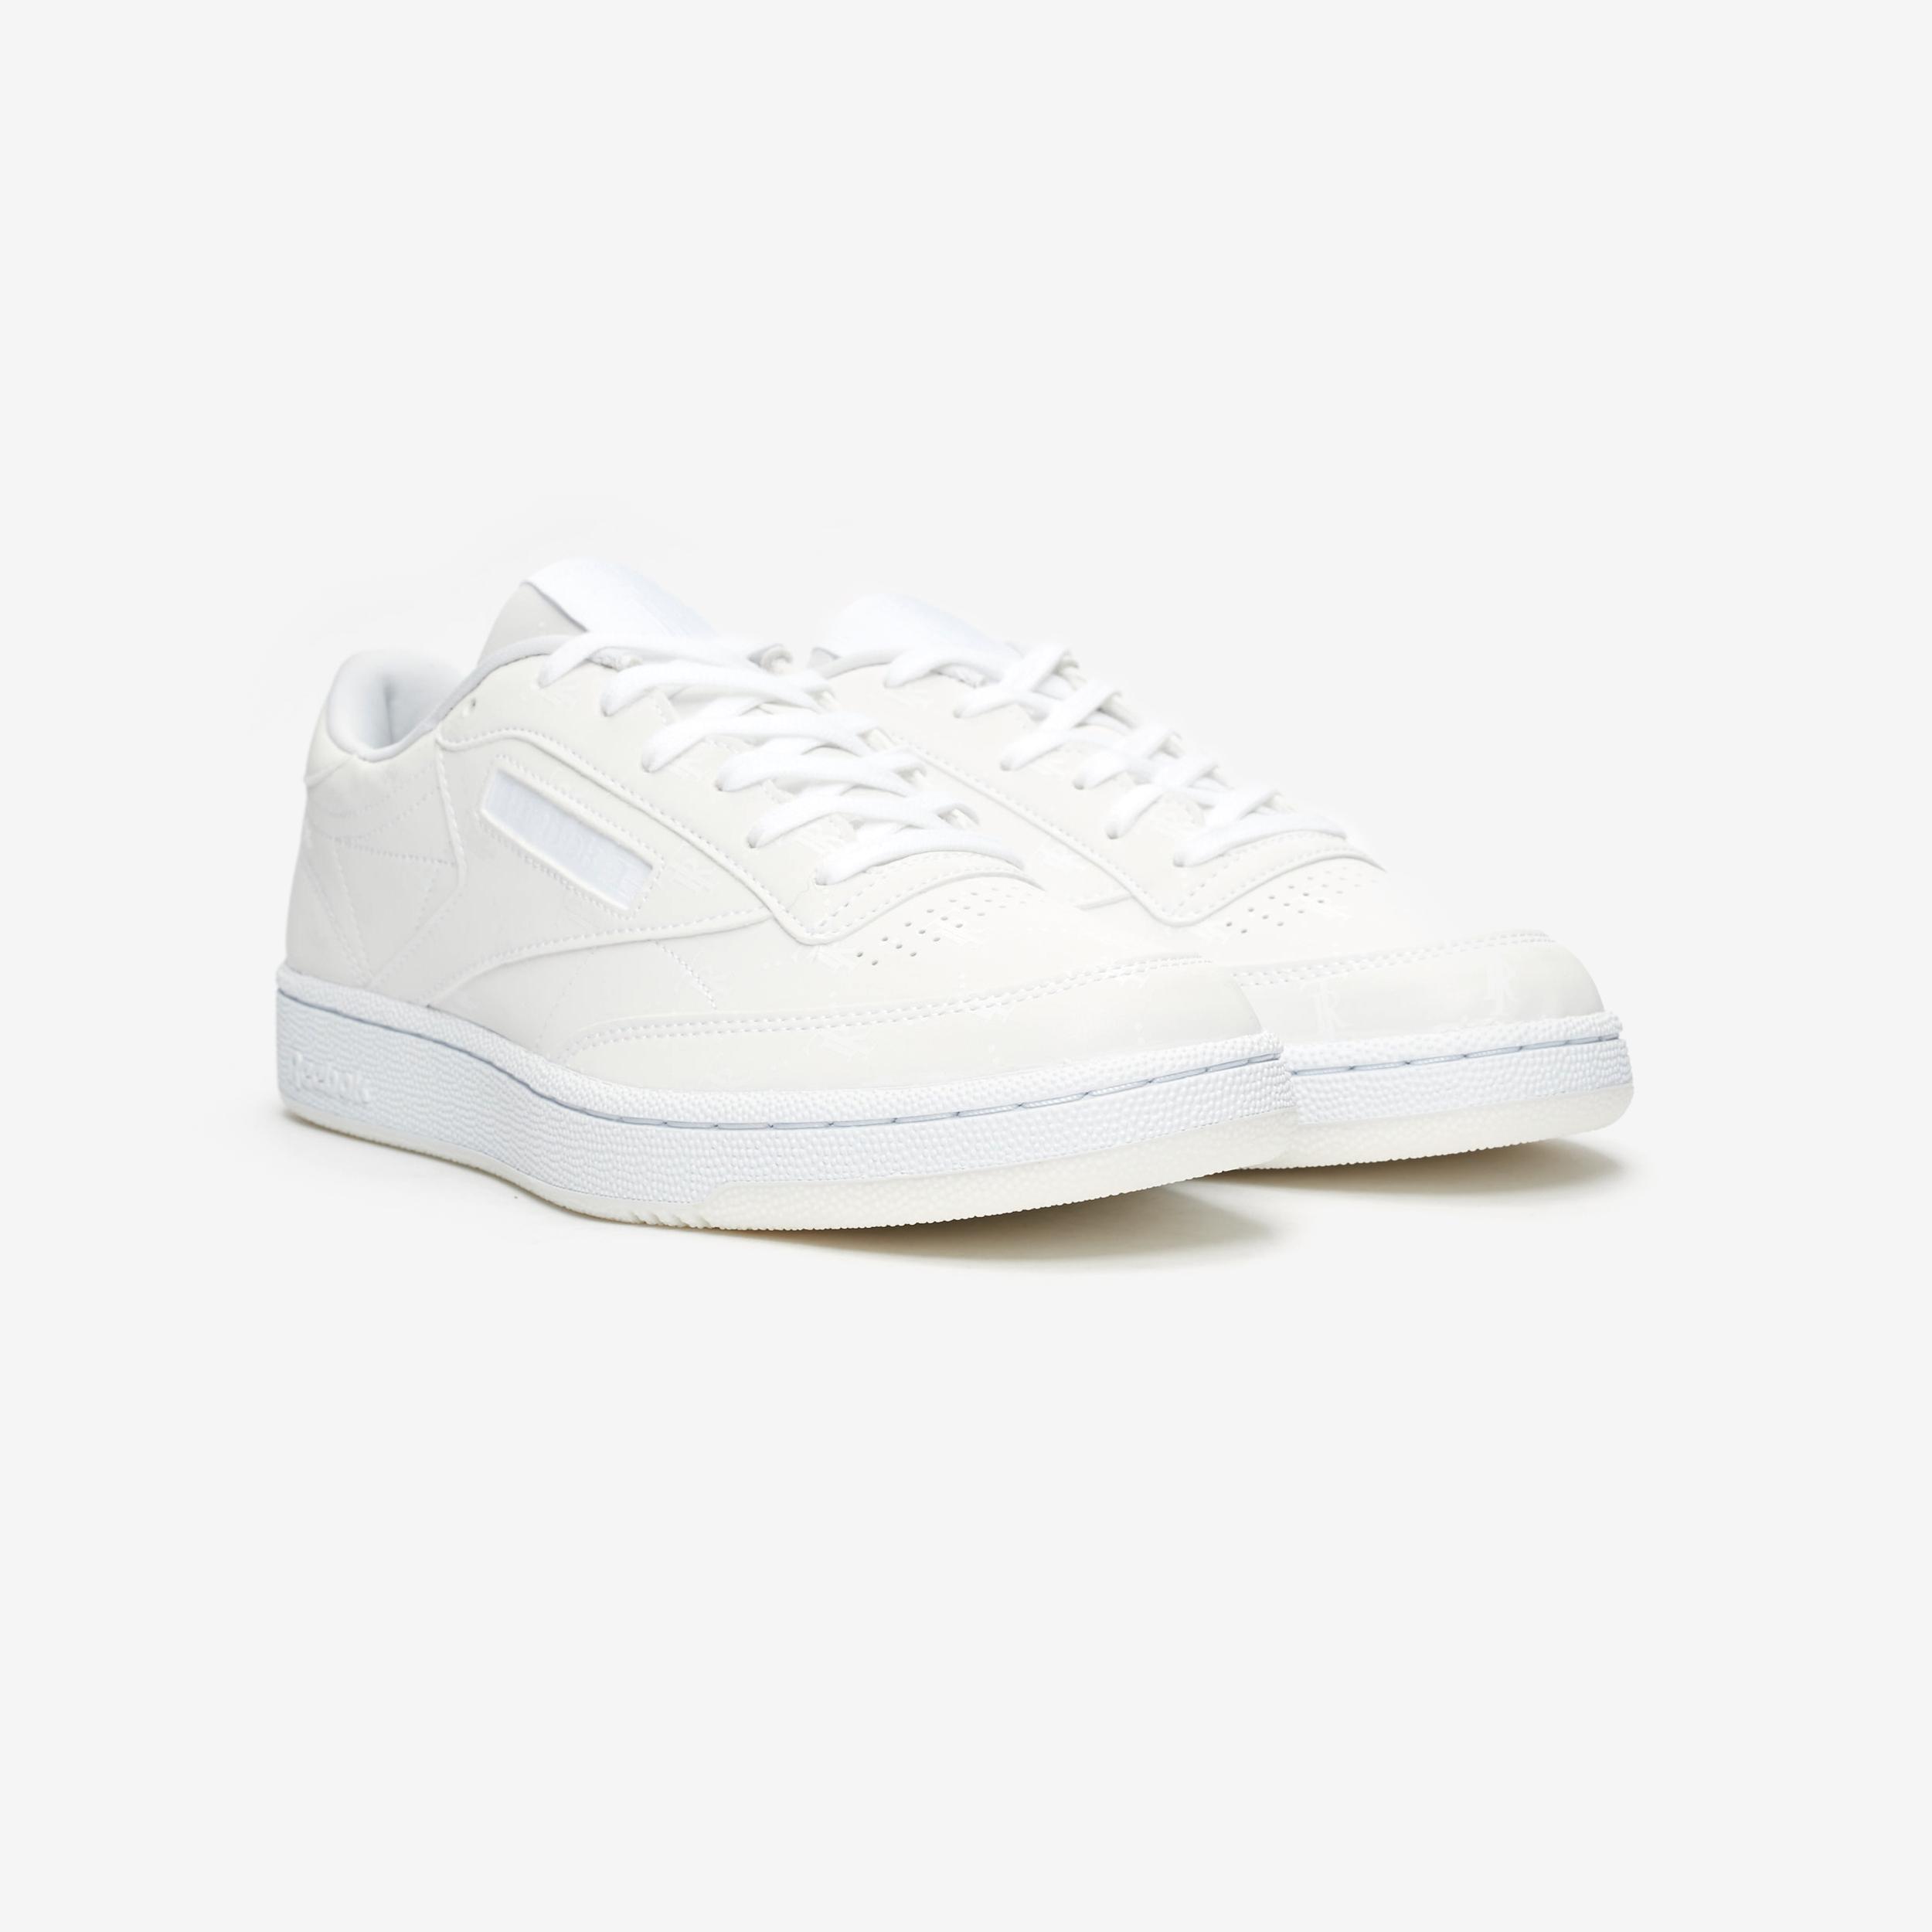 Reebok Club C 85 Mu X Tres Rasche Fw8453 Sneakersnstuff